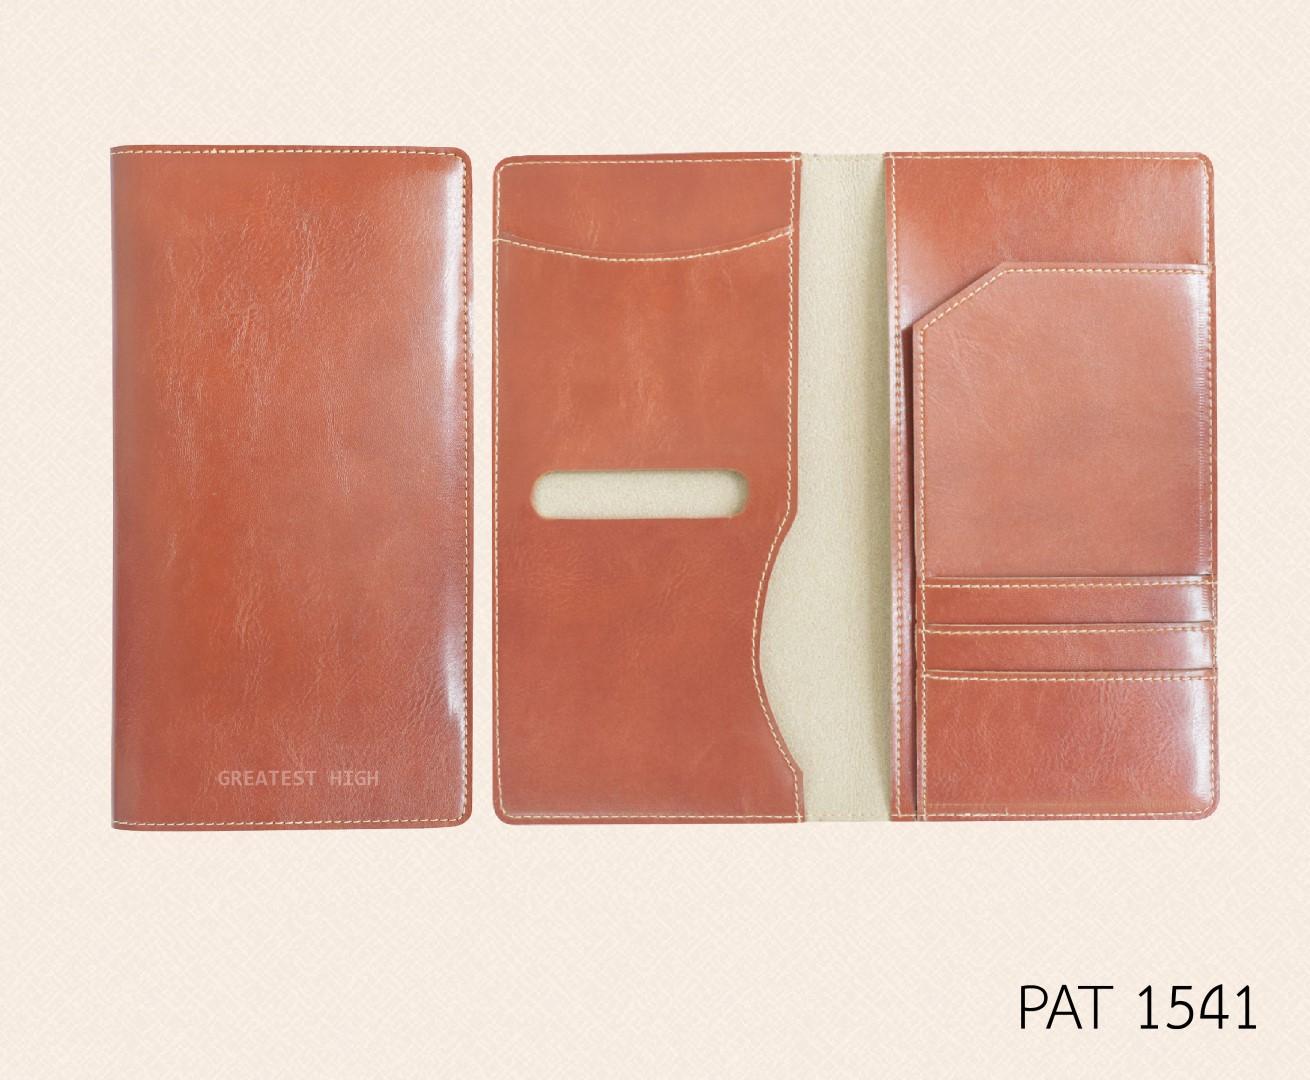 Airticker and Passport holder : PAT 1541